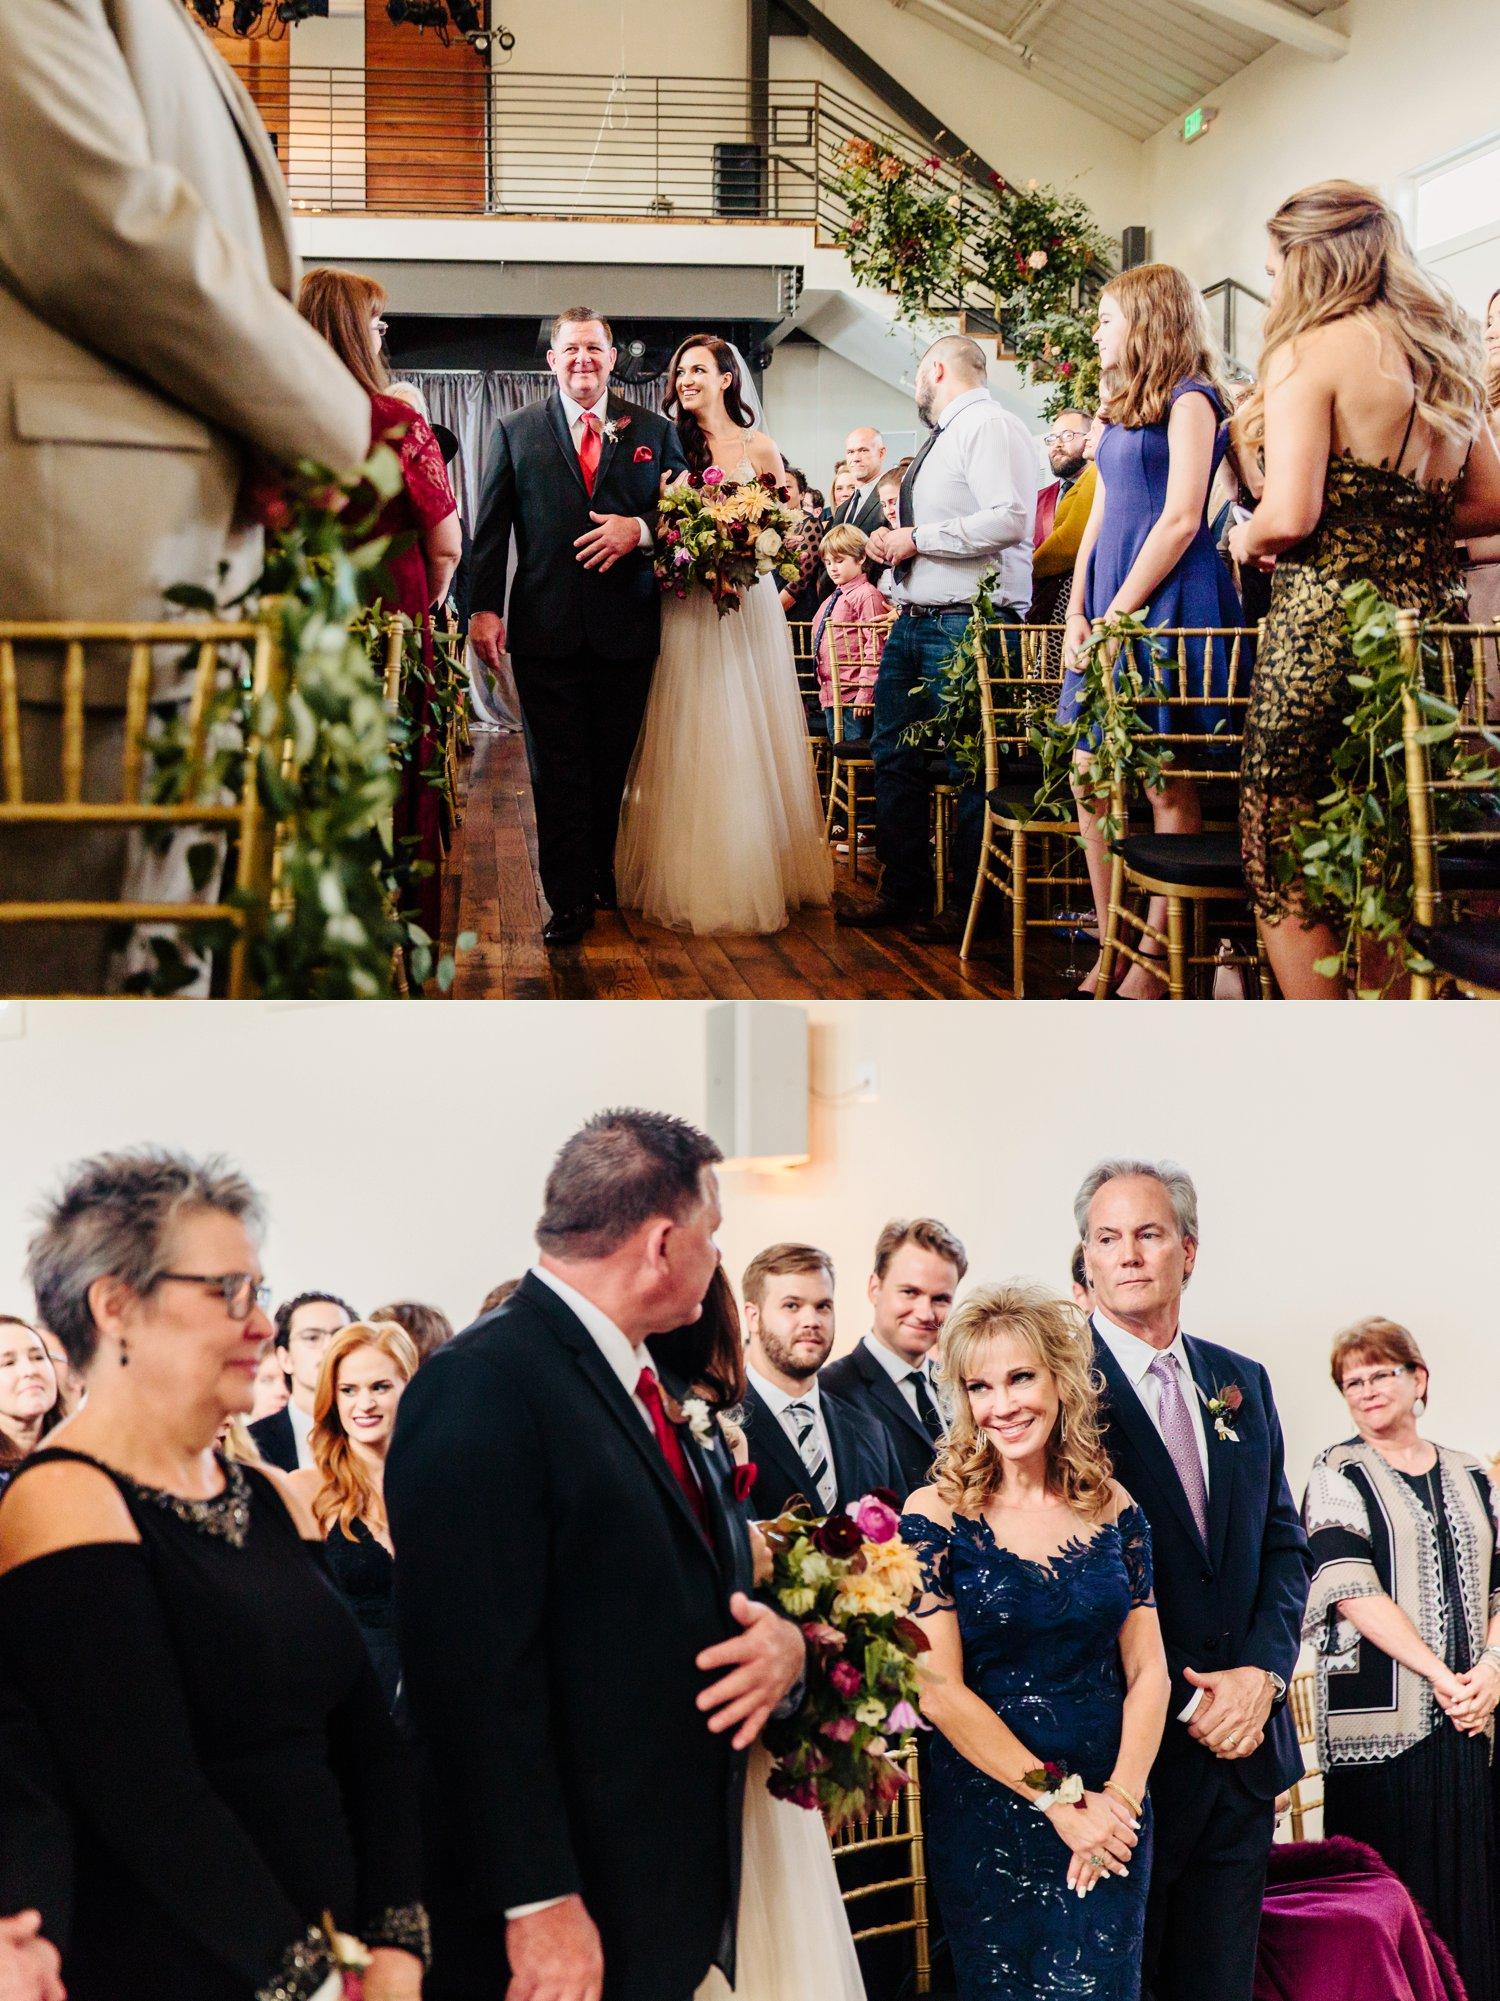 CK-Photo-Nashville-engagement-wedding-photographer-the-cordelle_0025.jpg